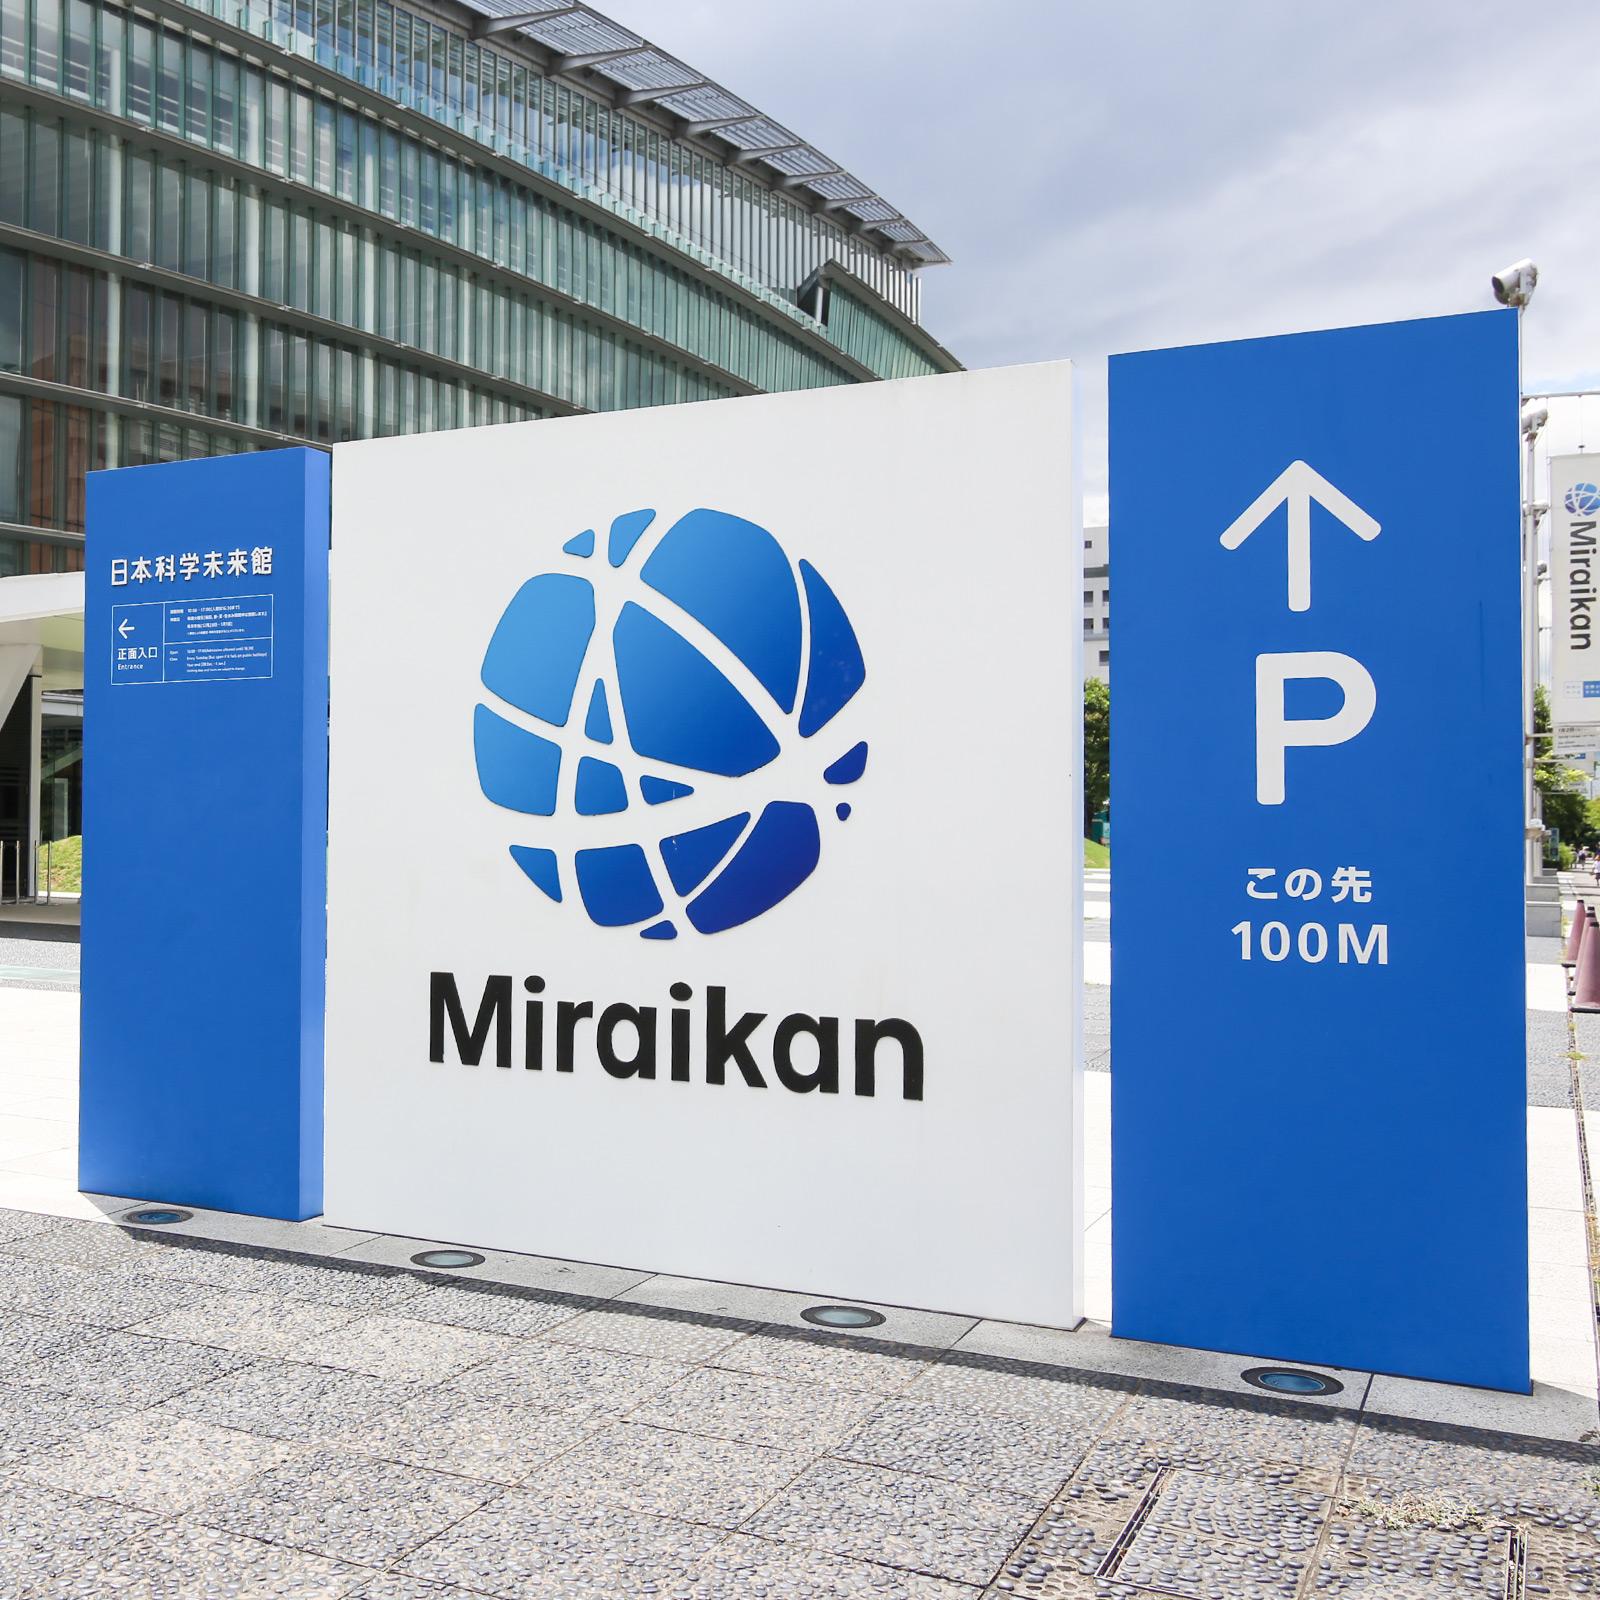 Miraikanの愛称と青いシンボルマーク。地球と衛星軌道、細胞分裂、人と人、人と情報といった地球上のさまざまなネットワーク、電子の動きなどをイメージさせる。